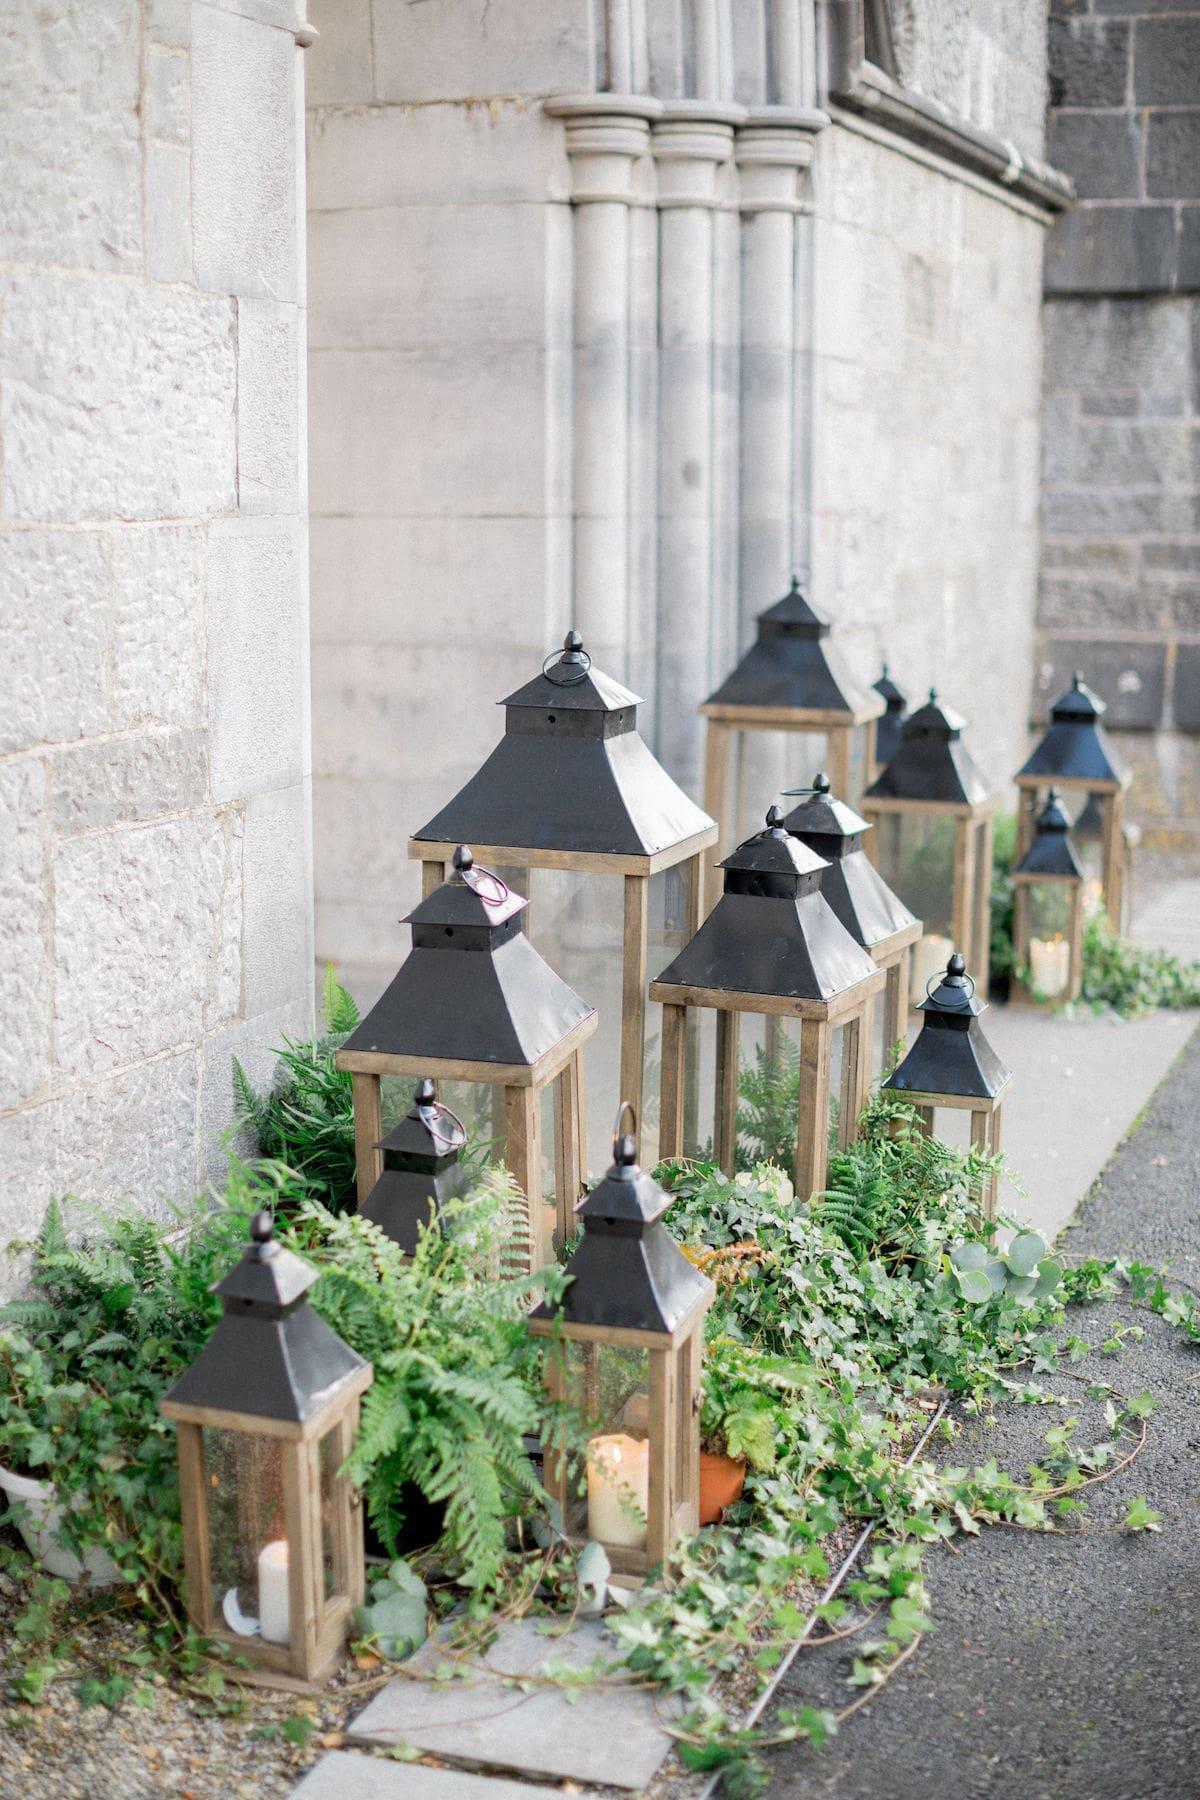 Lanterns and greenery church wedding ceremony décor